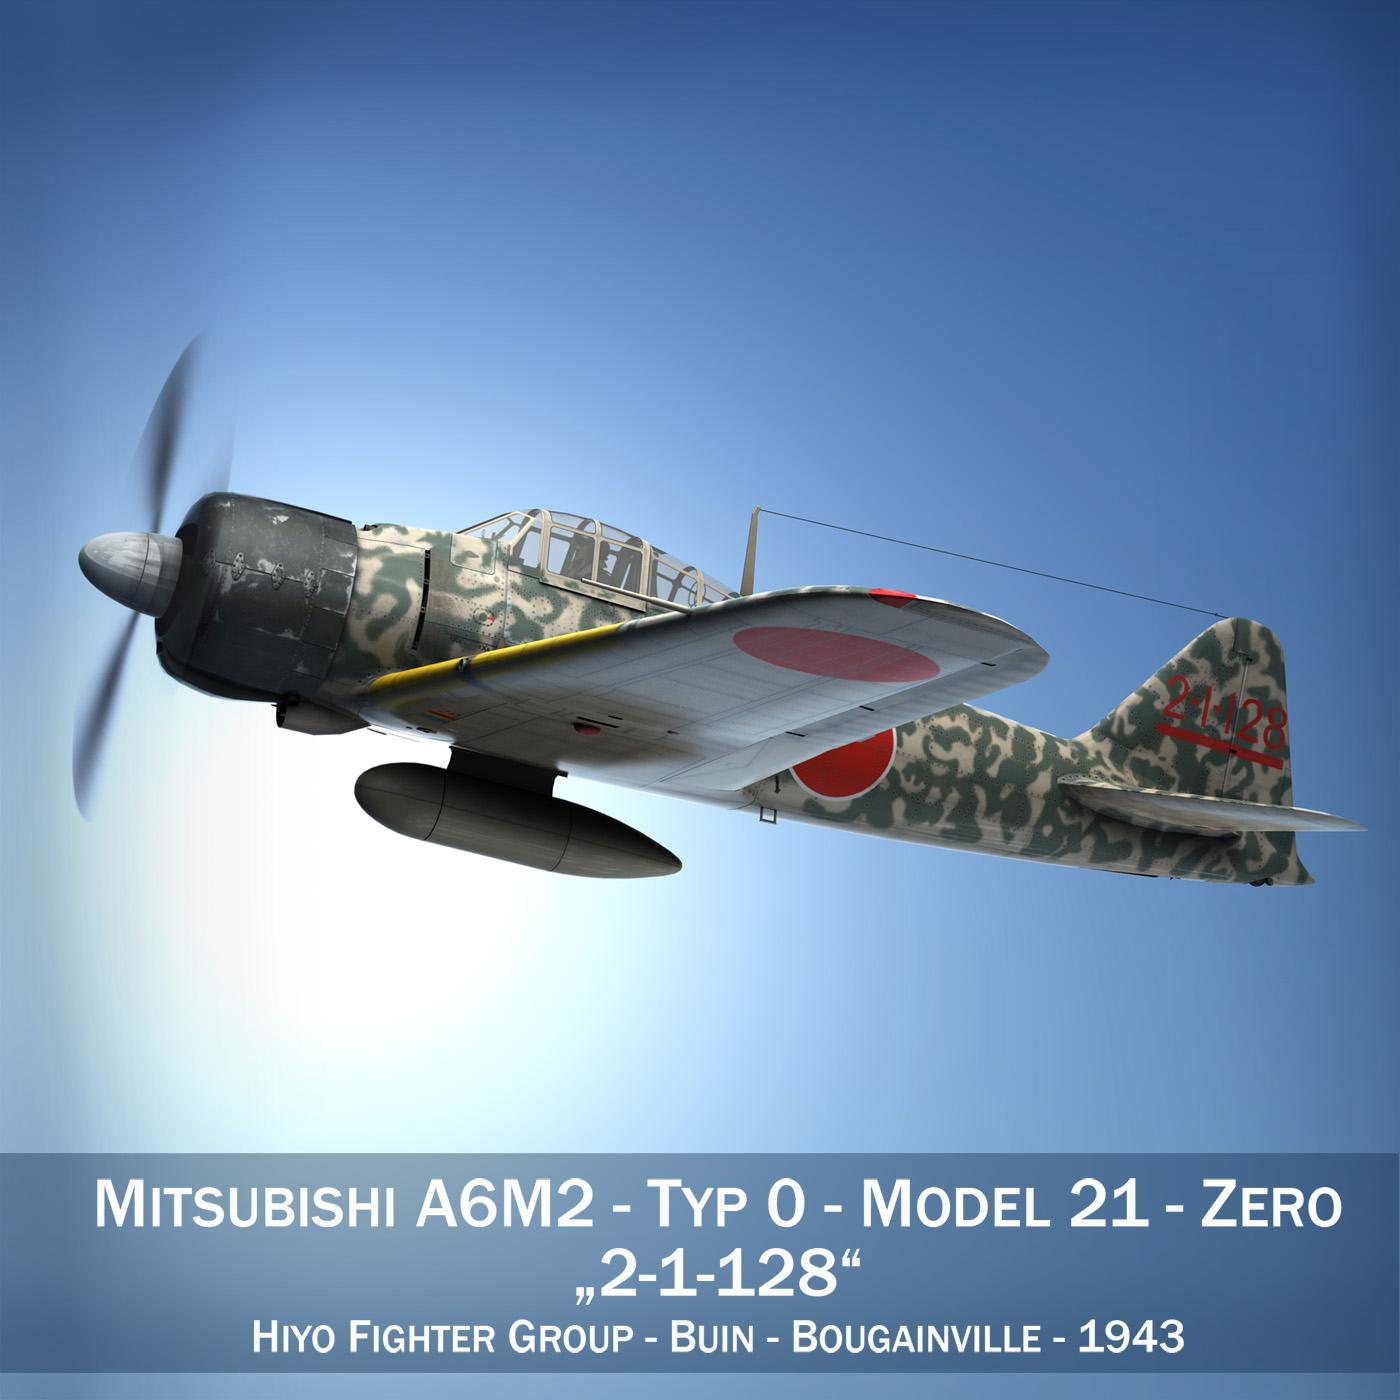 Mitsubishi A6M2 Zero - Hiyo Fighter Group 3d model fbx c4d lwo lws lw obj 274299